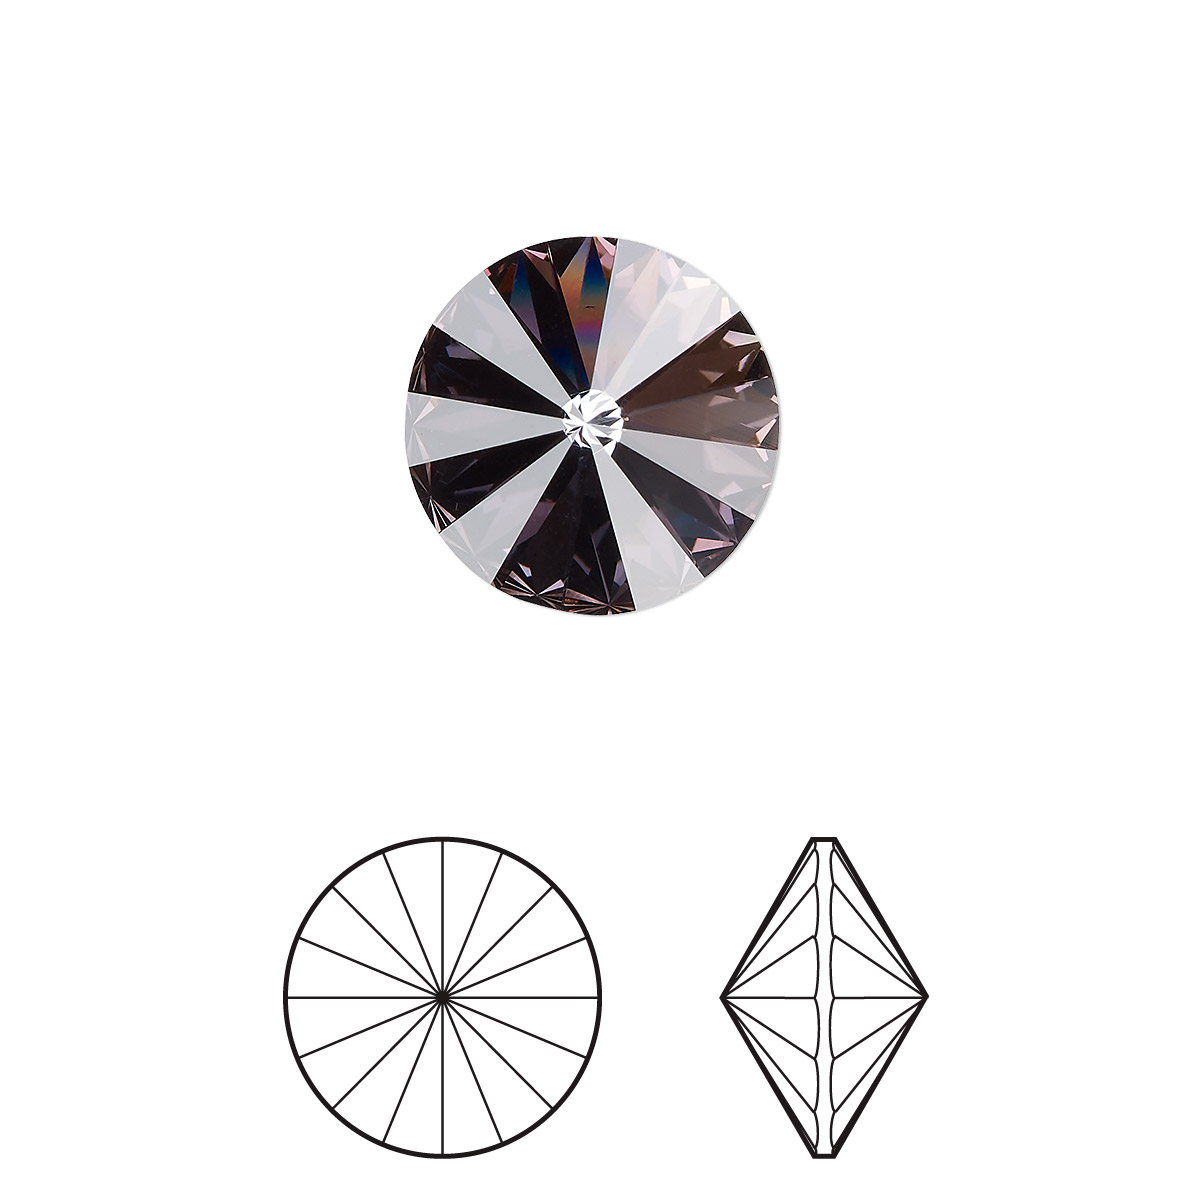 29e3854e343ca Chaton, Swarovski® crystal rhinestone with third-party coating ...